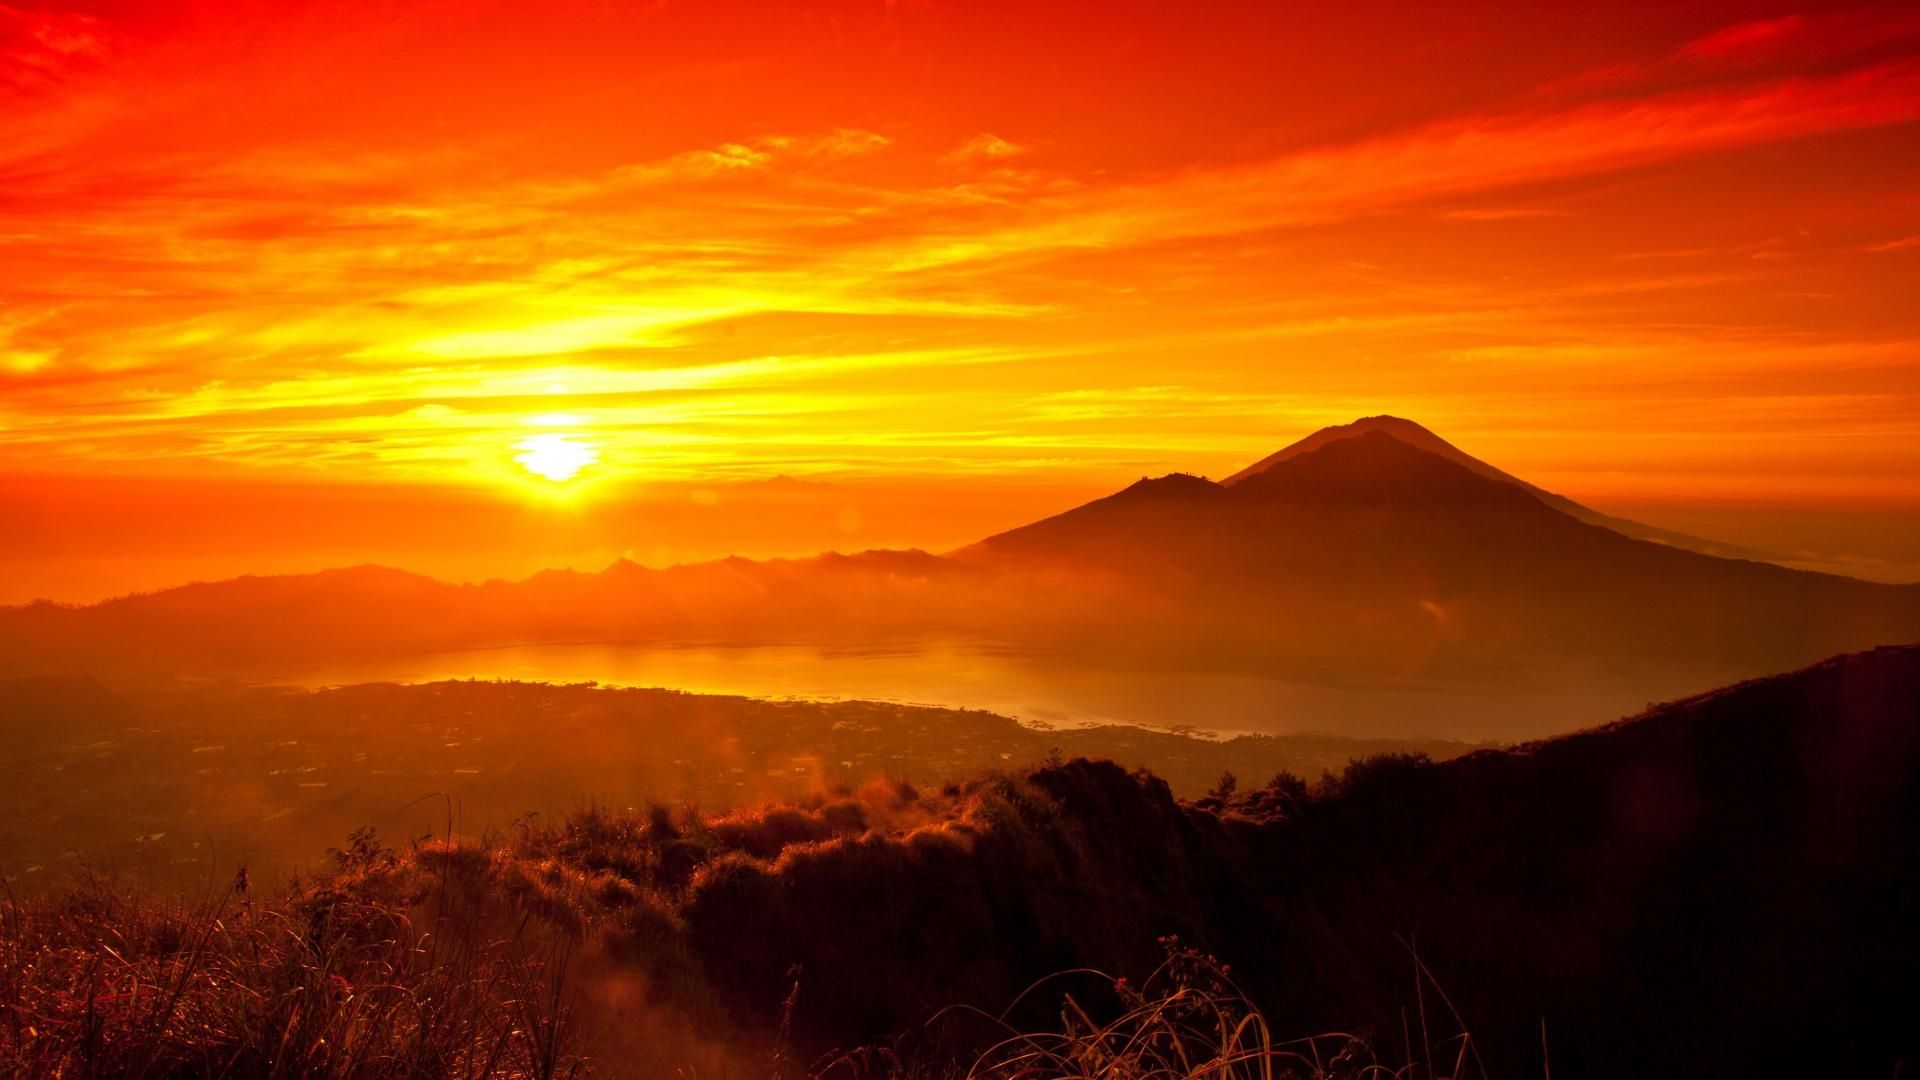 10 Tempat Terbaik Untuk Melihat Sunset Klikhotelcom Fotografi Matahari Terbit Pemandangan Gambar